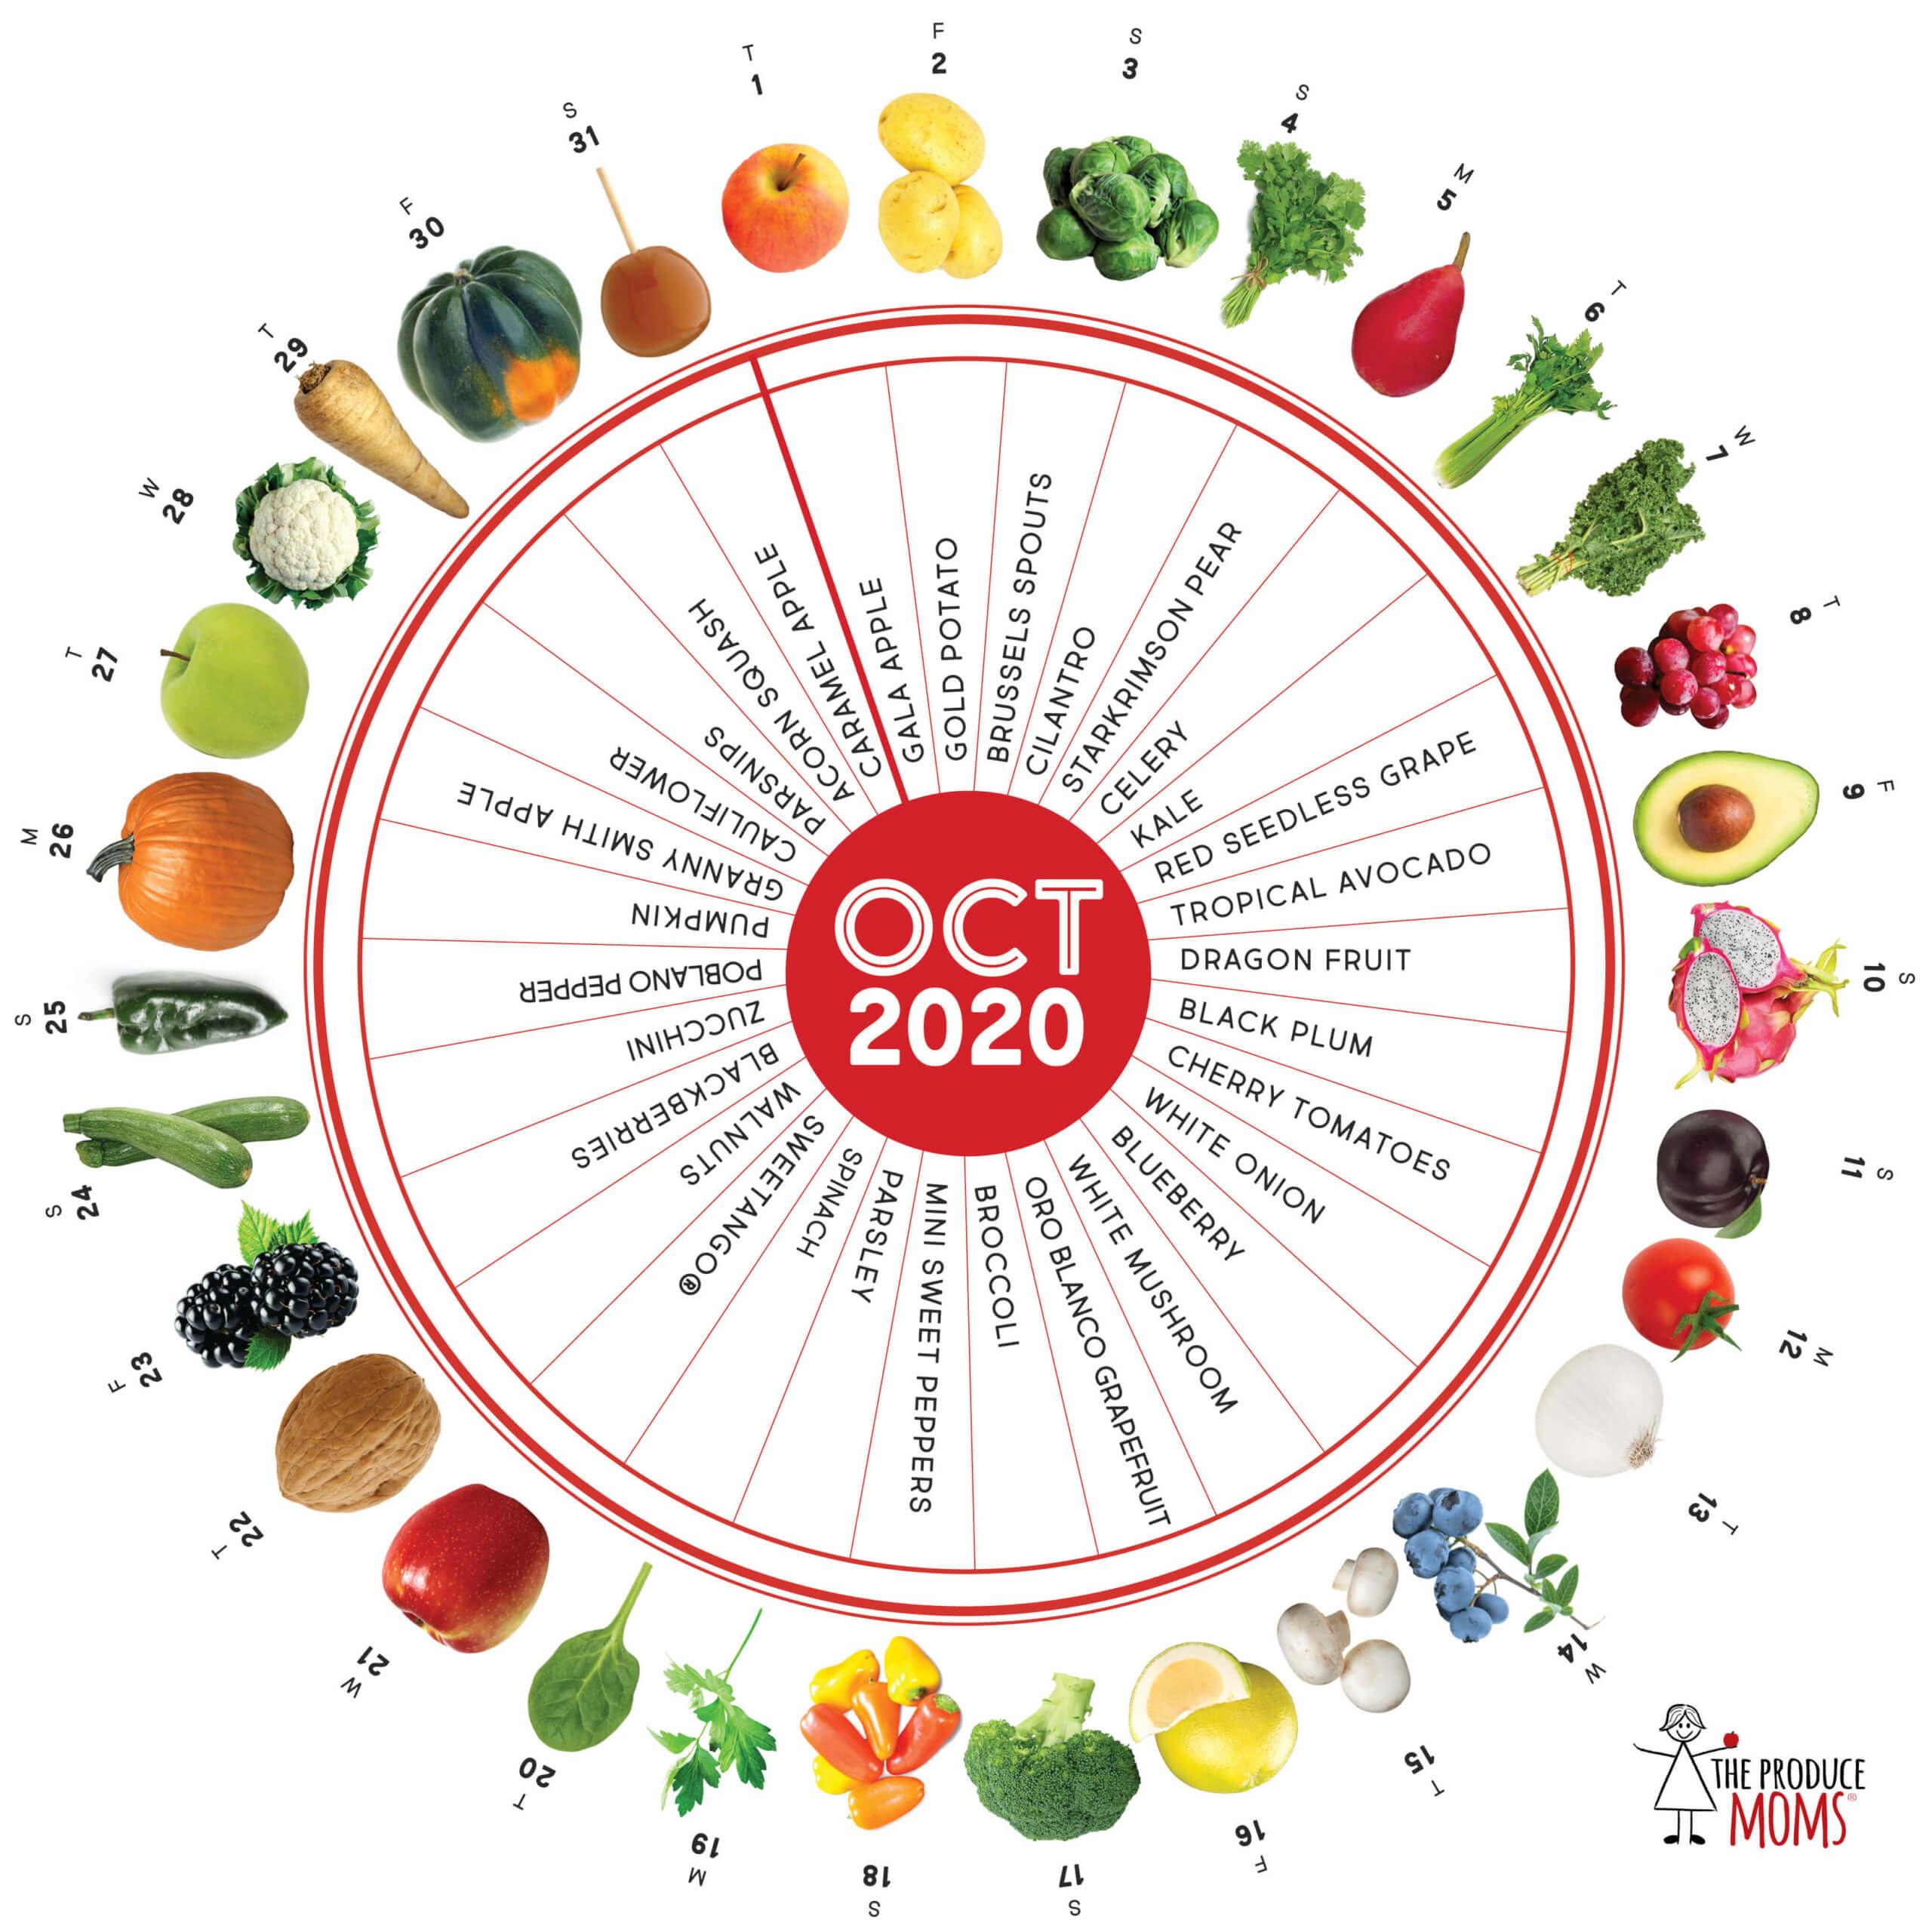 October 2020 Produce Challenge Calendar